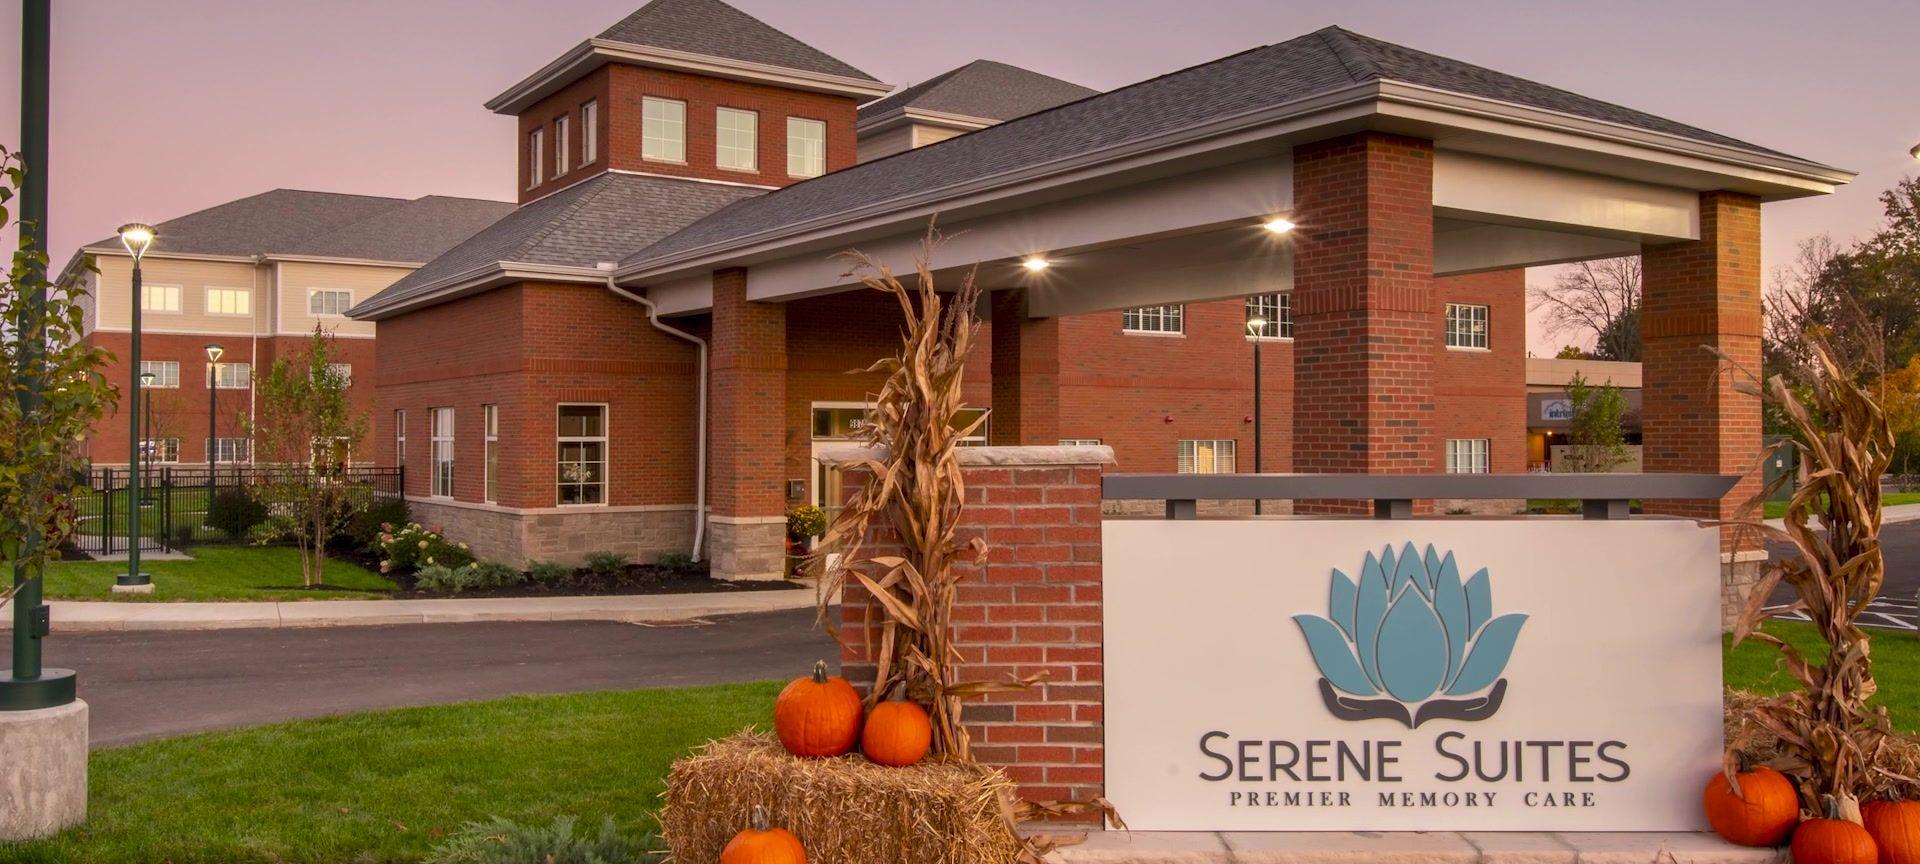 Serene Suites Memory Care